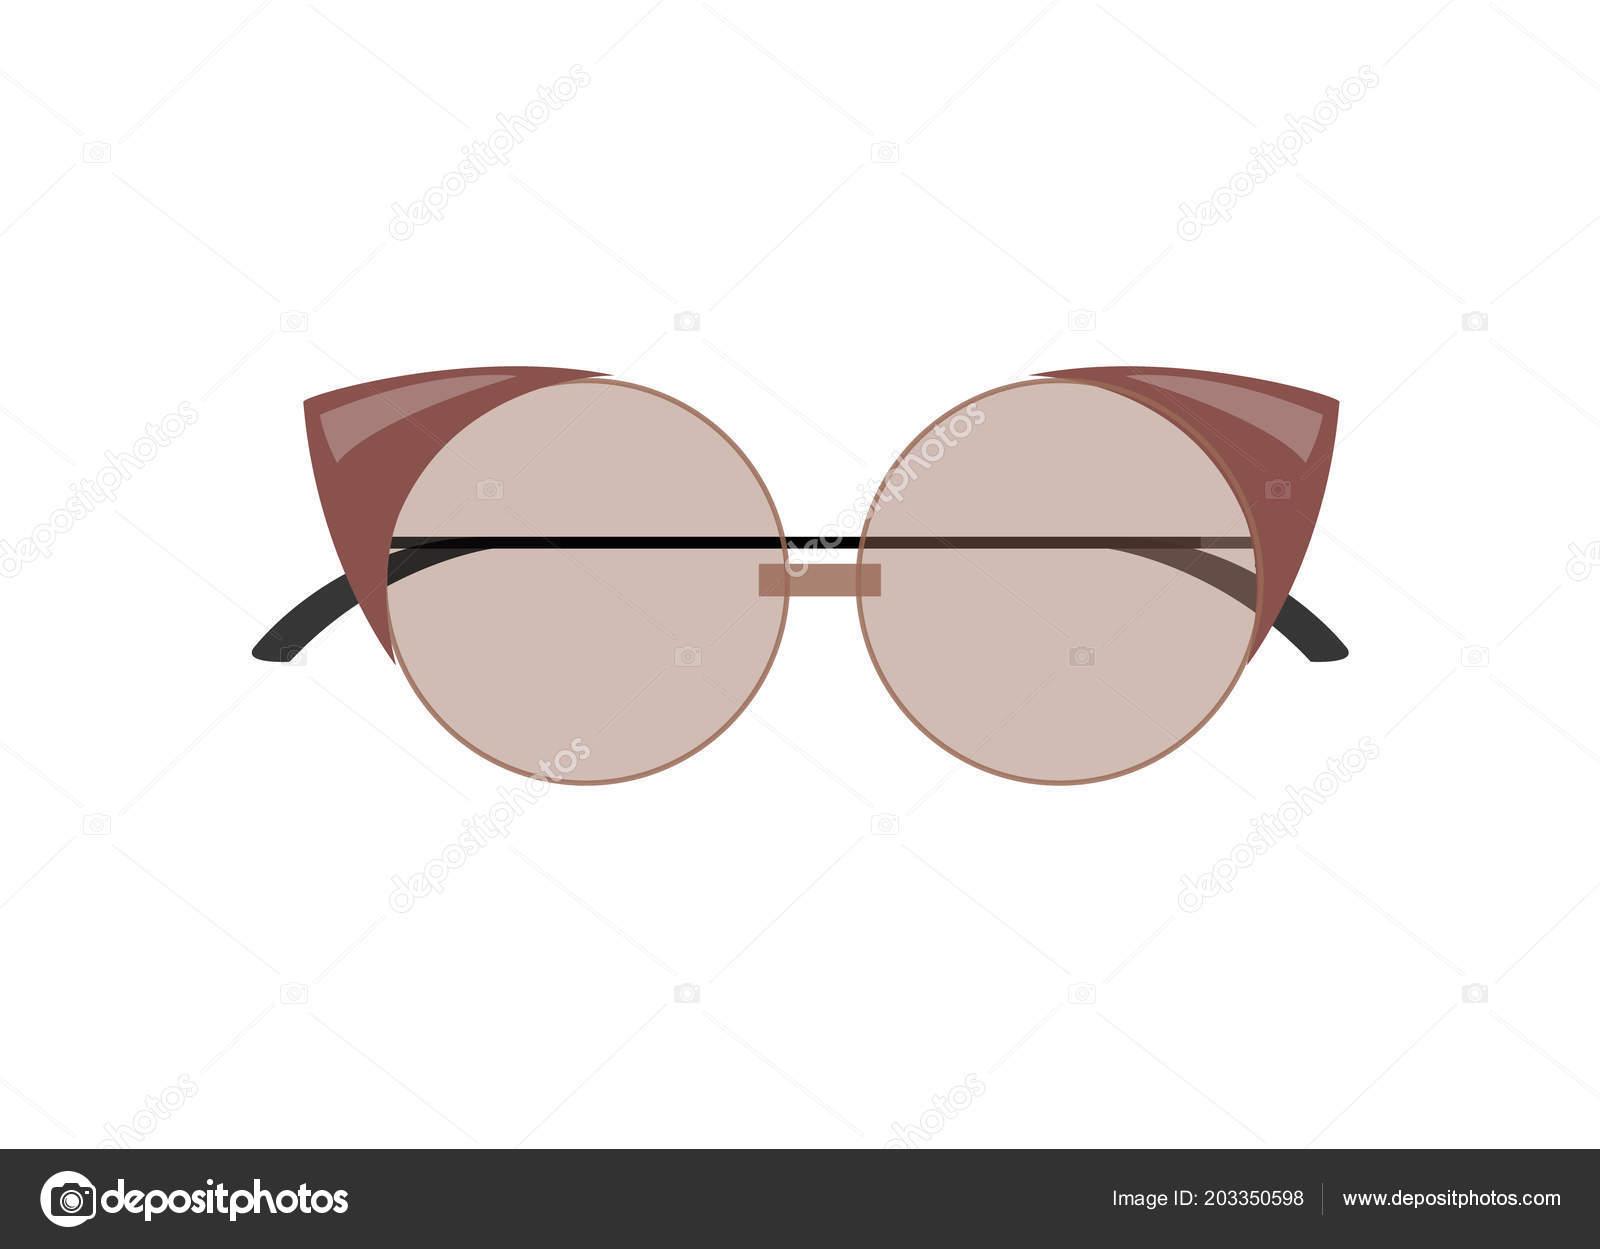 Gafas de sol con estilo ojo de gato femenino de forma redondeada ...